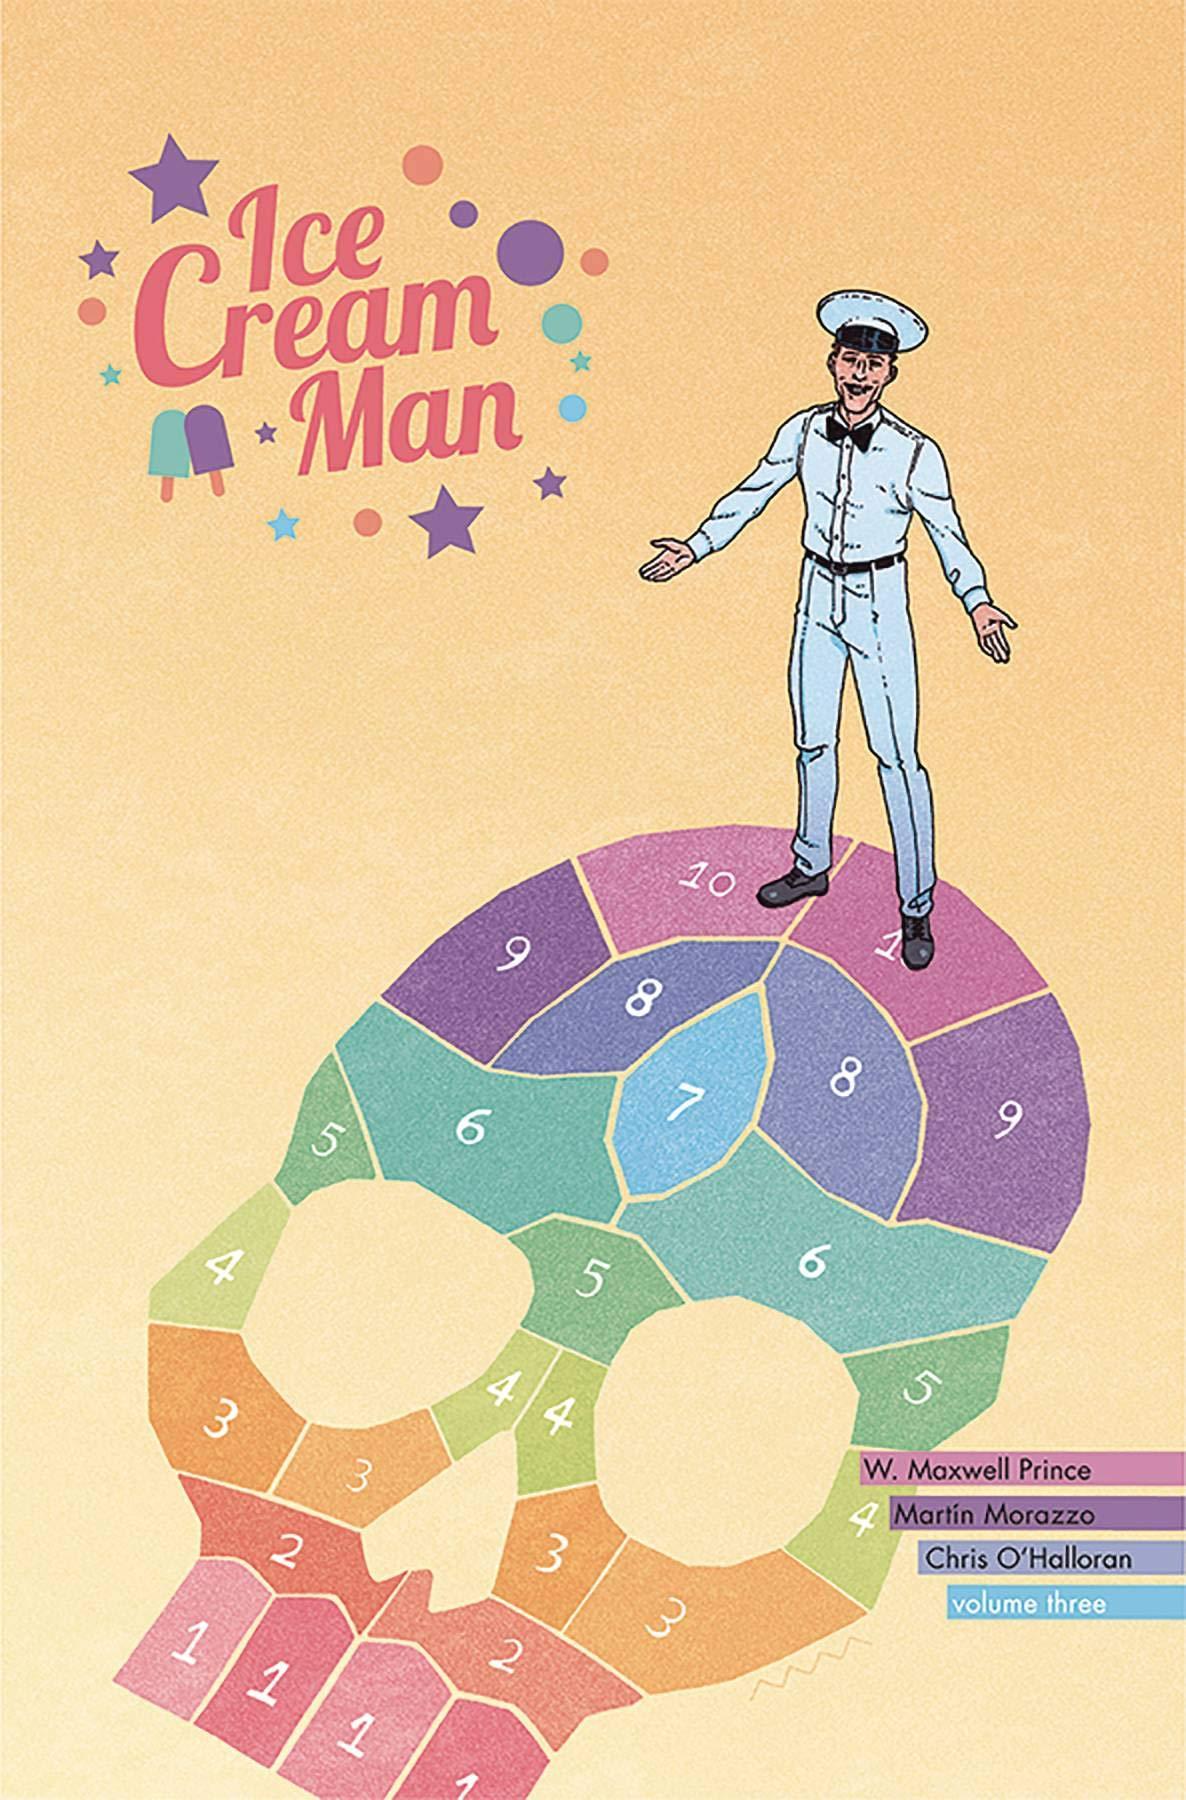 Best Comics of 2019: Ice Cream Man